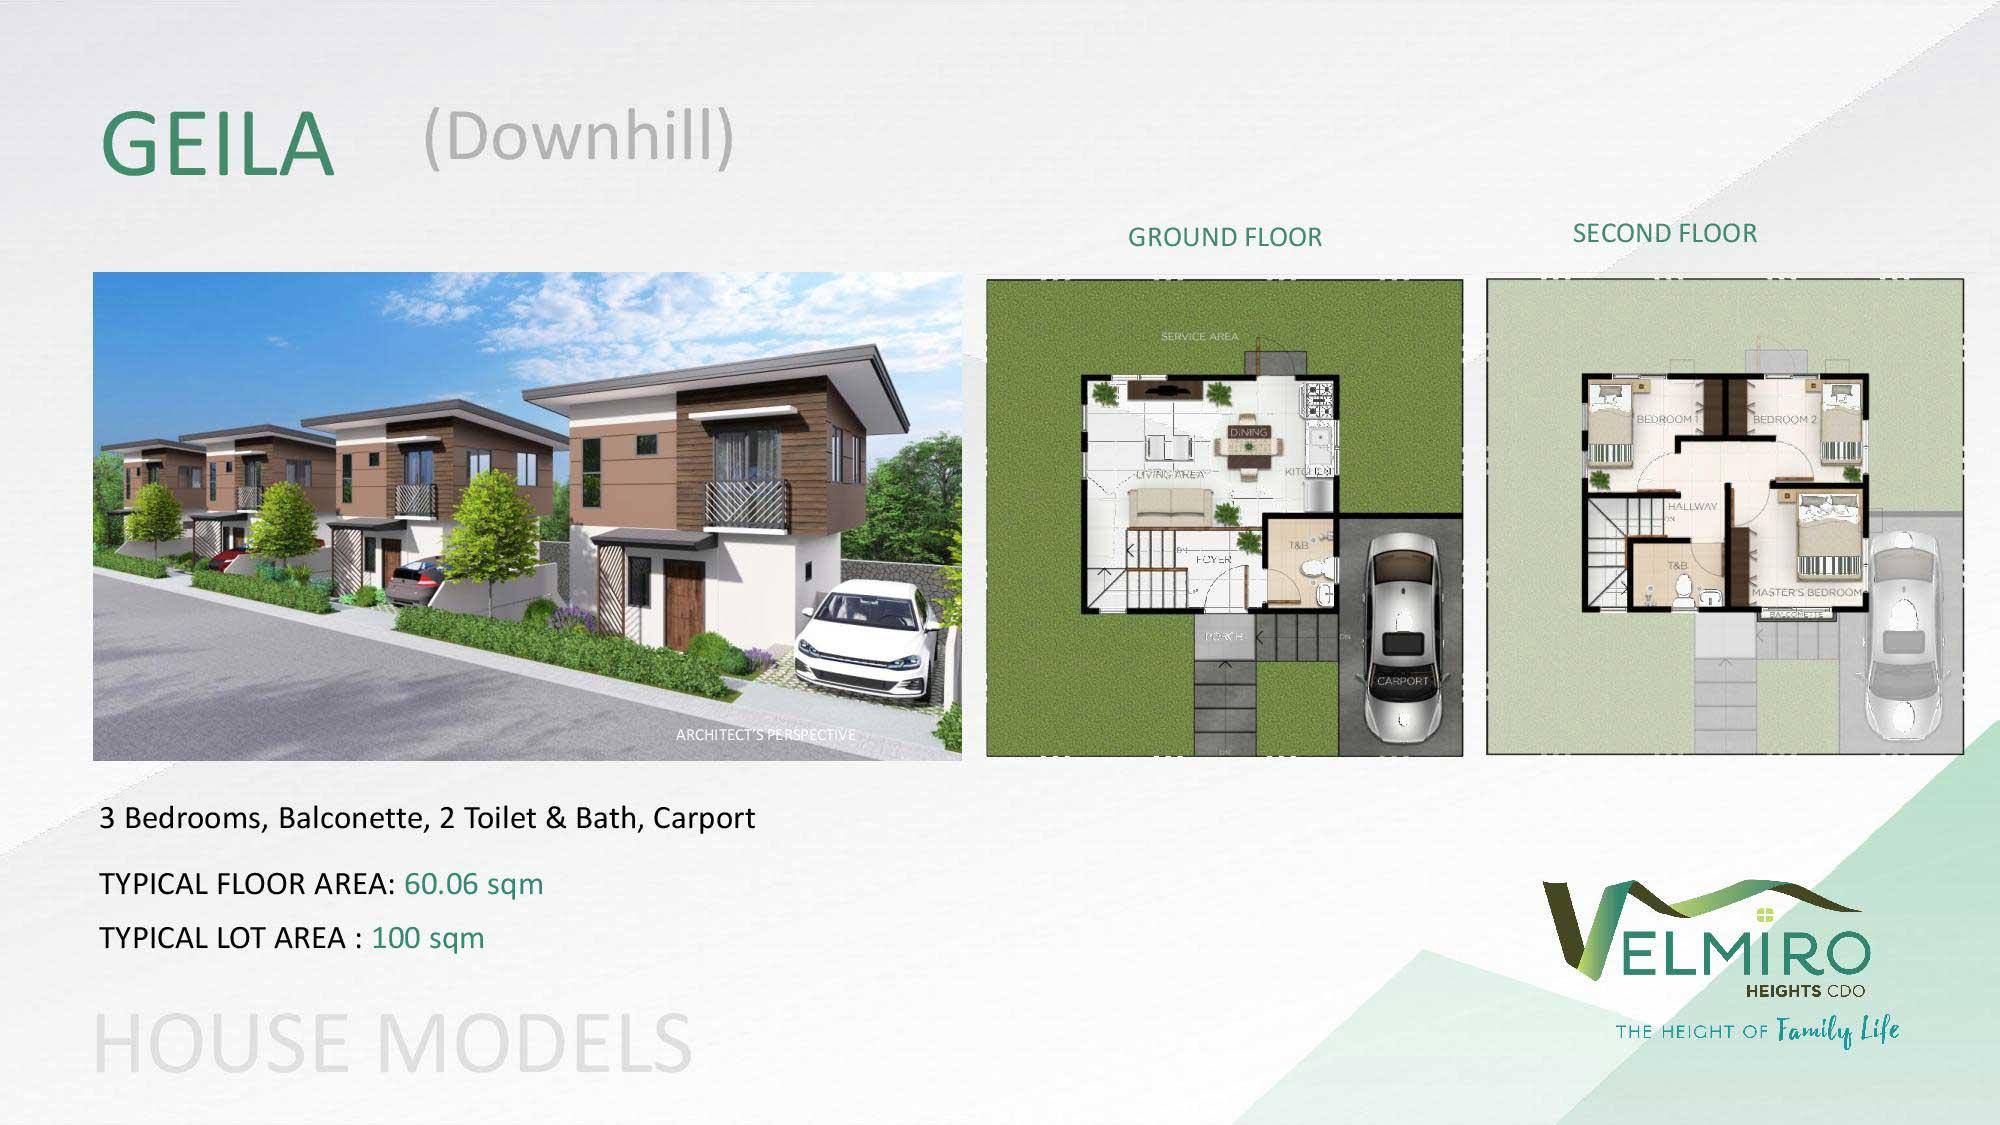 Velmiro heights agusan house model geila downhill web gmc